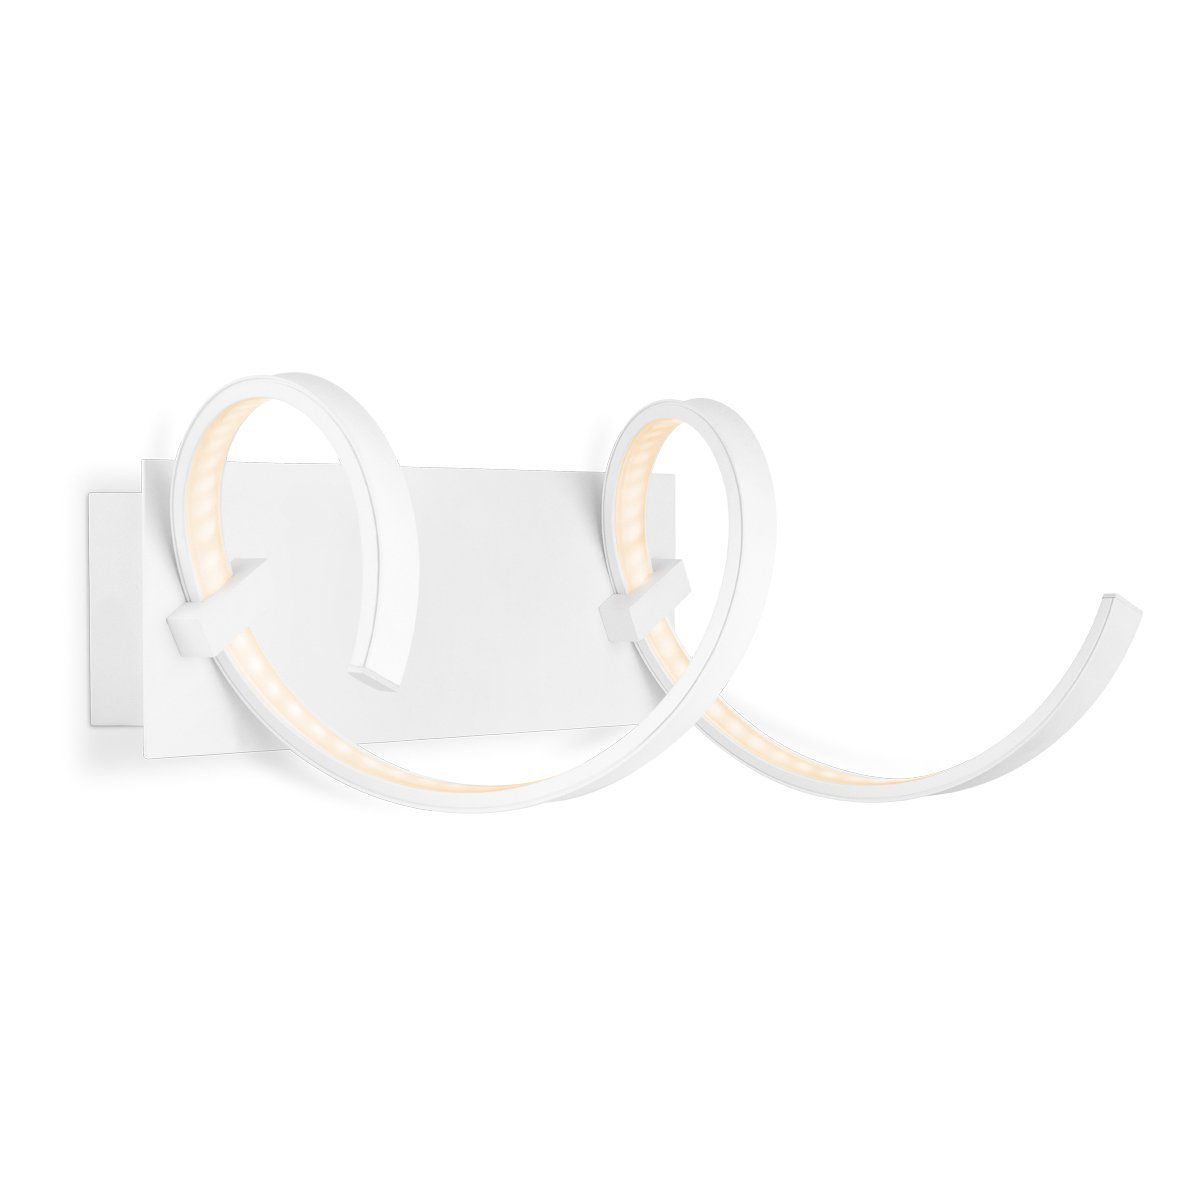 Home sweet home wandlamp LED Twist  45 cm - wit